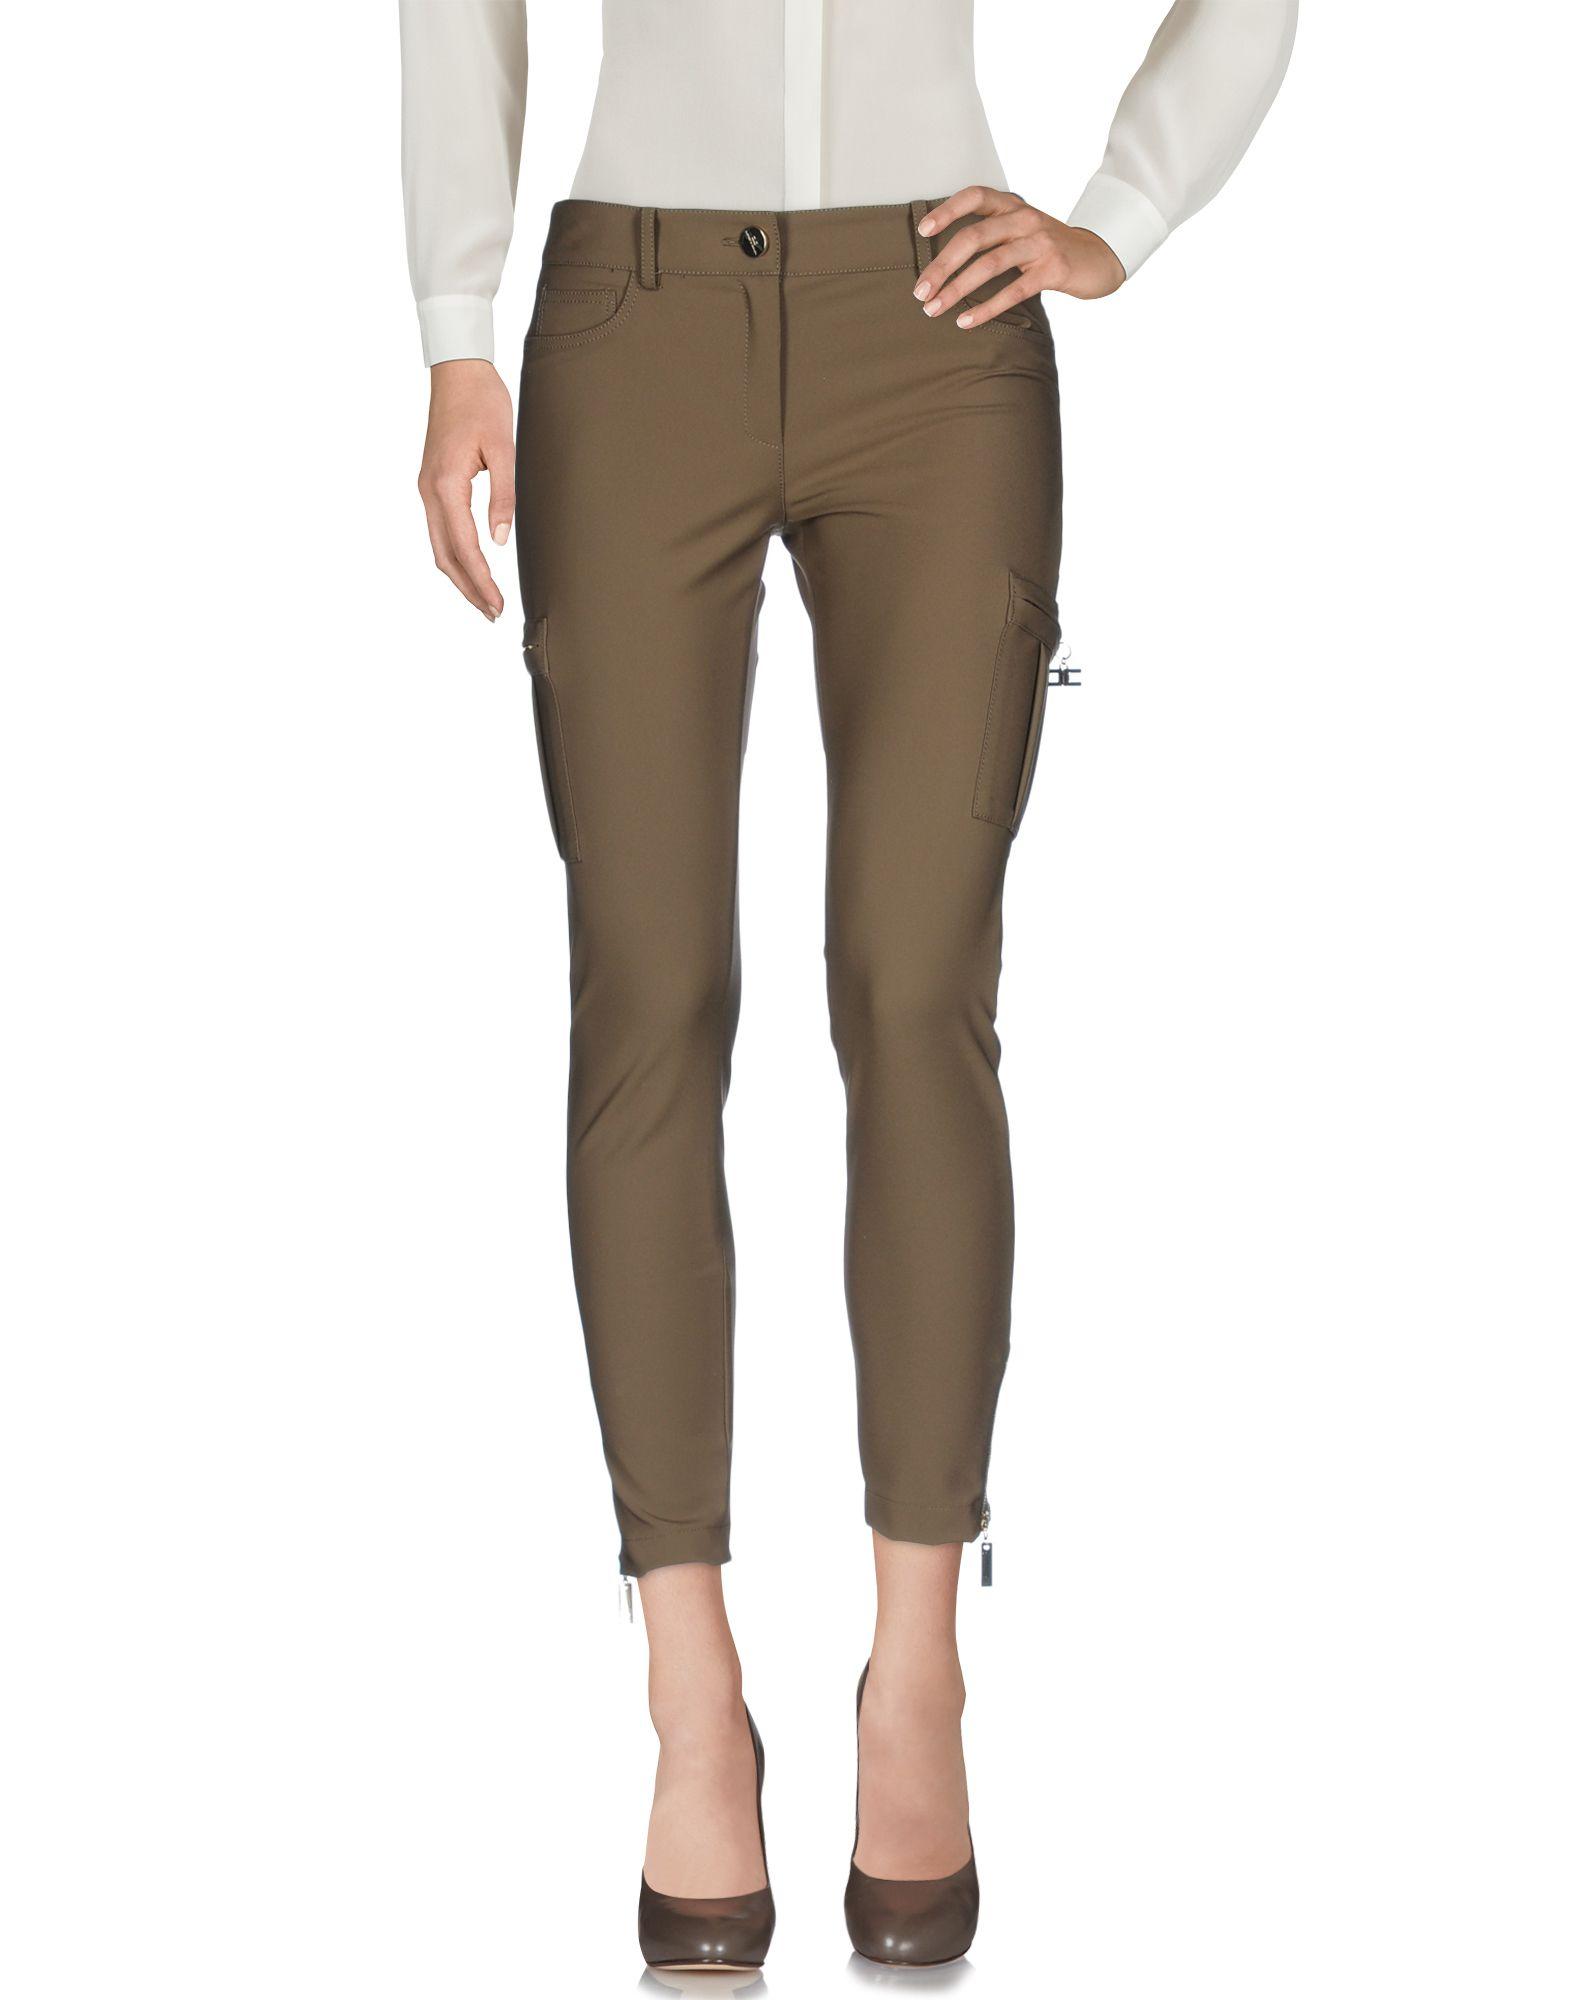 ELISABETTA FRANCHI Damen Hose Farbe Khaki Größe 6